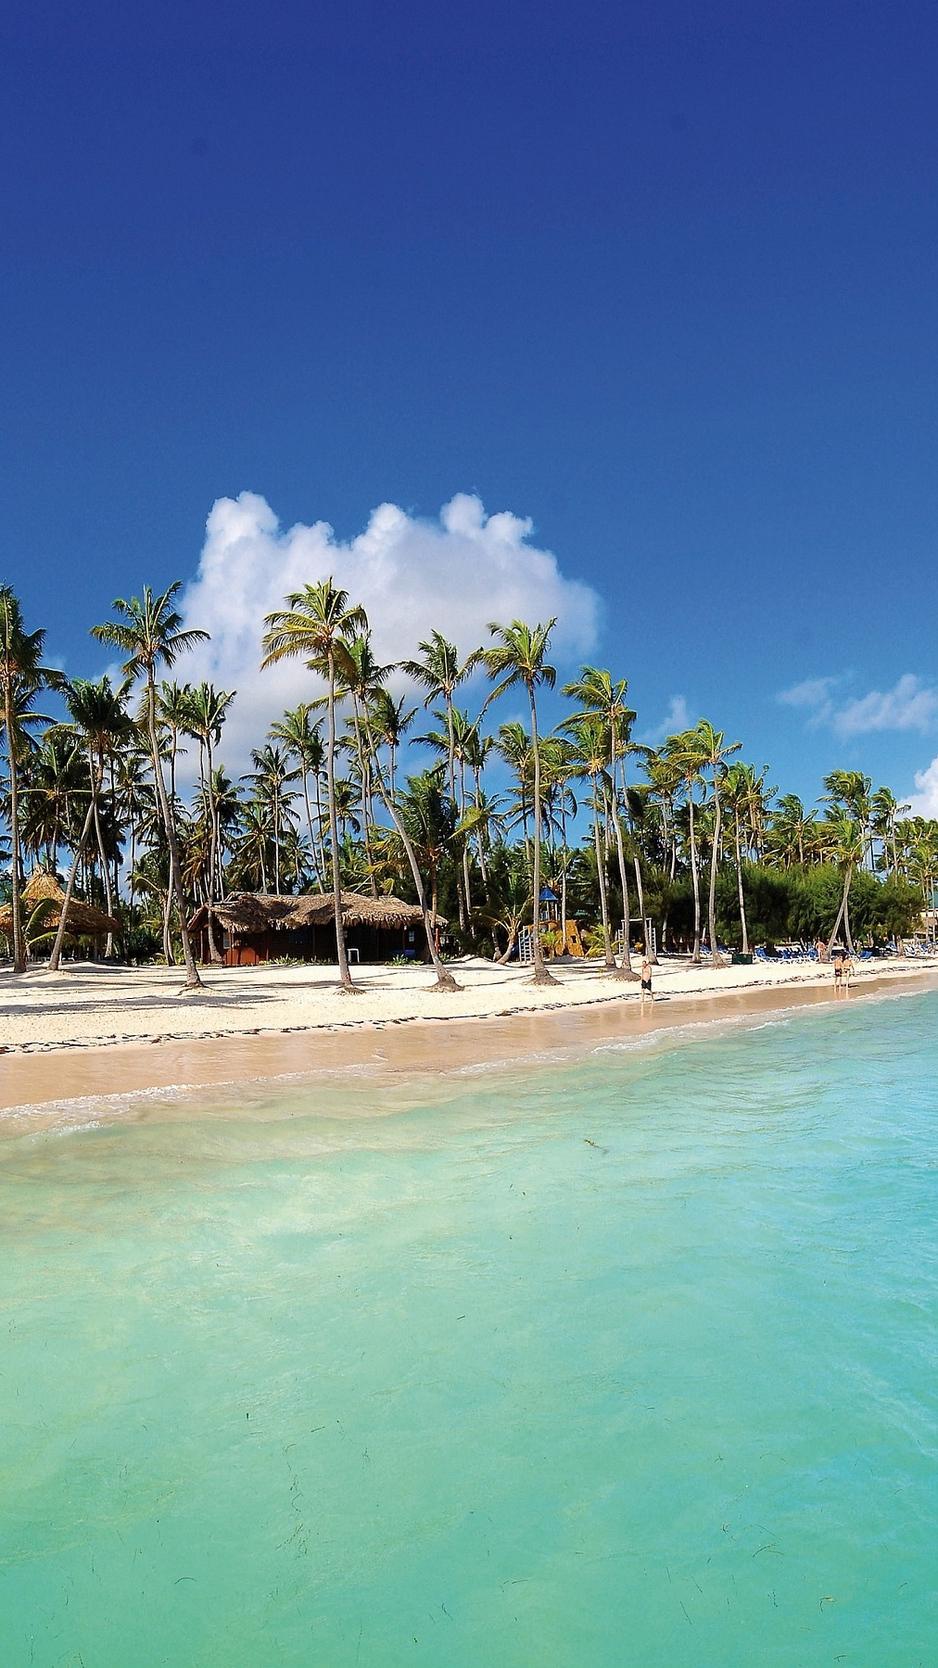 Iphone Wallpaper Beach Palm Trees - HD Wallpaper